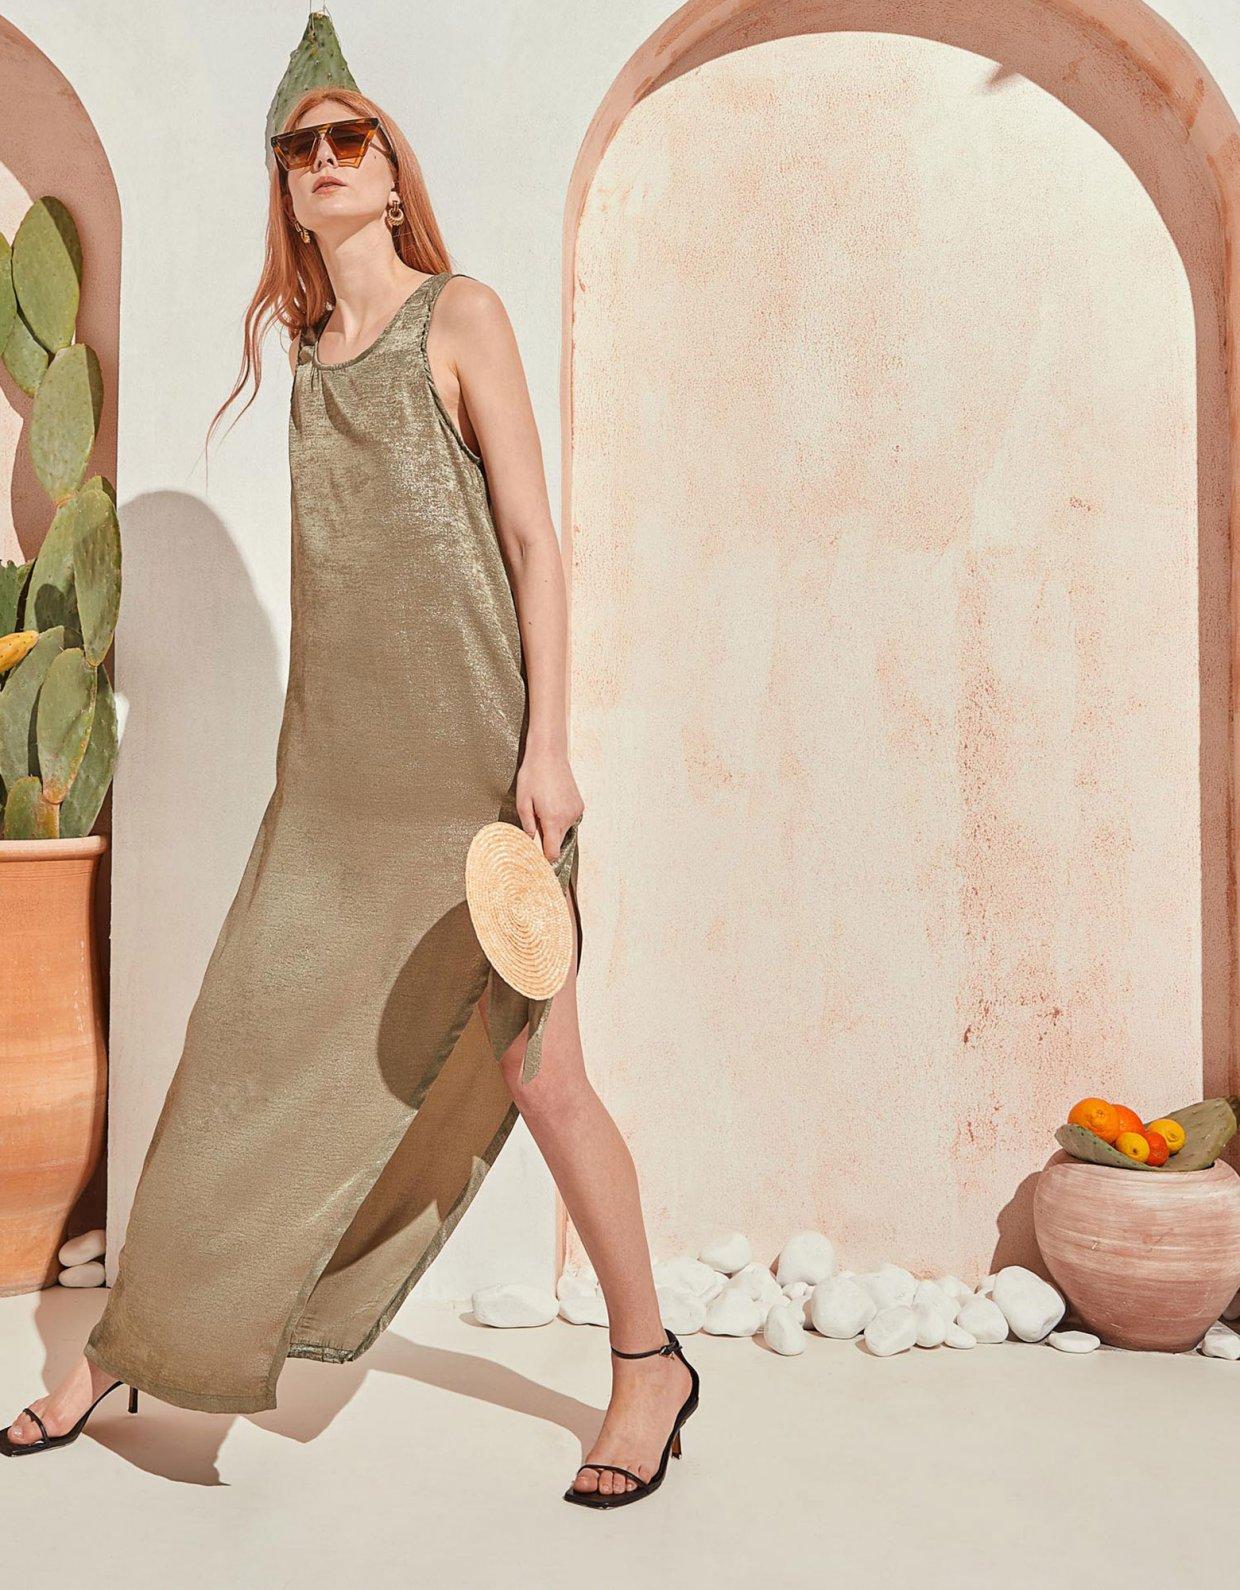 The Knl's Wander dress sparkling khaki